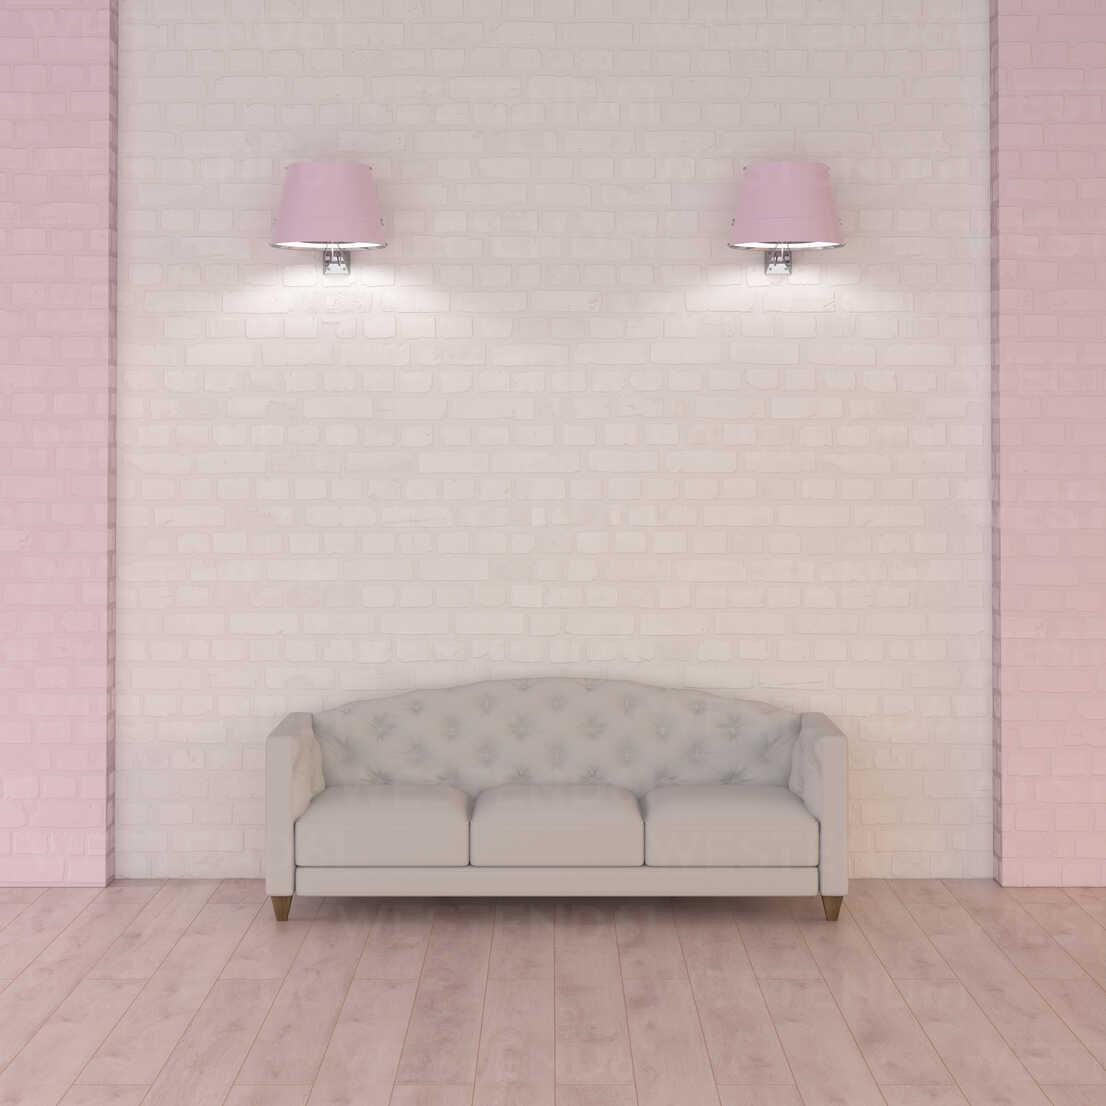 Couch under pink wall lamps, 3d rendering - UWF01343 - HuberStarke/Westend61